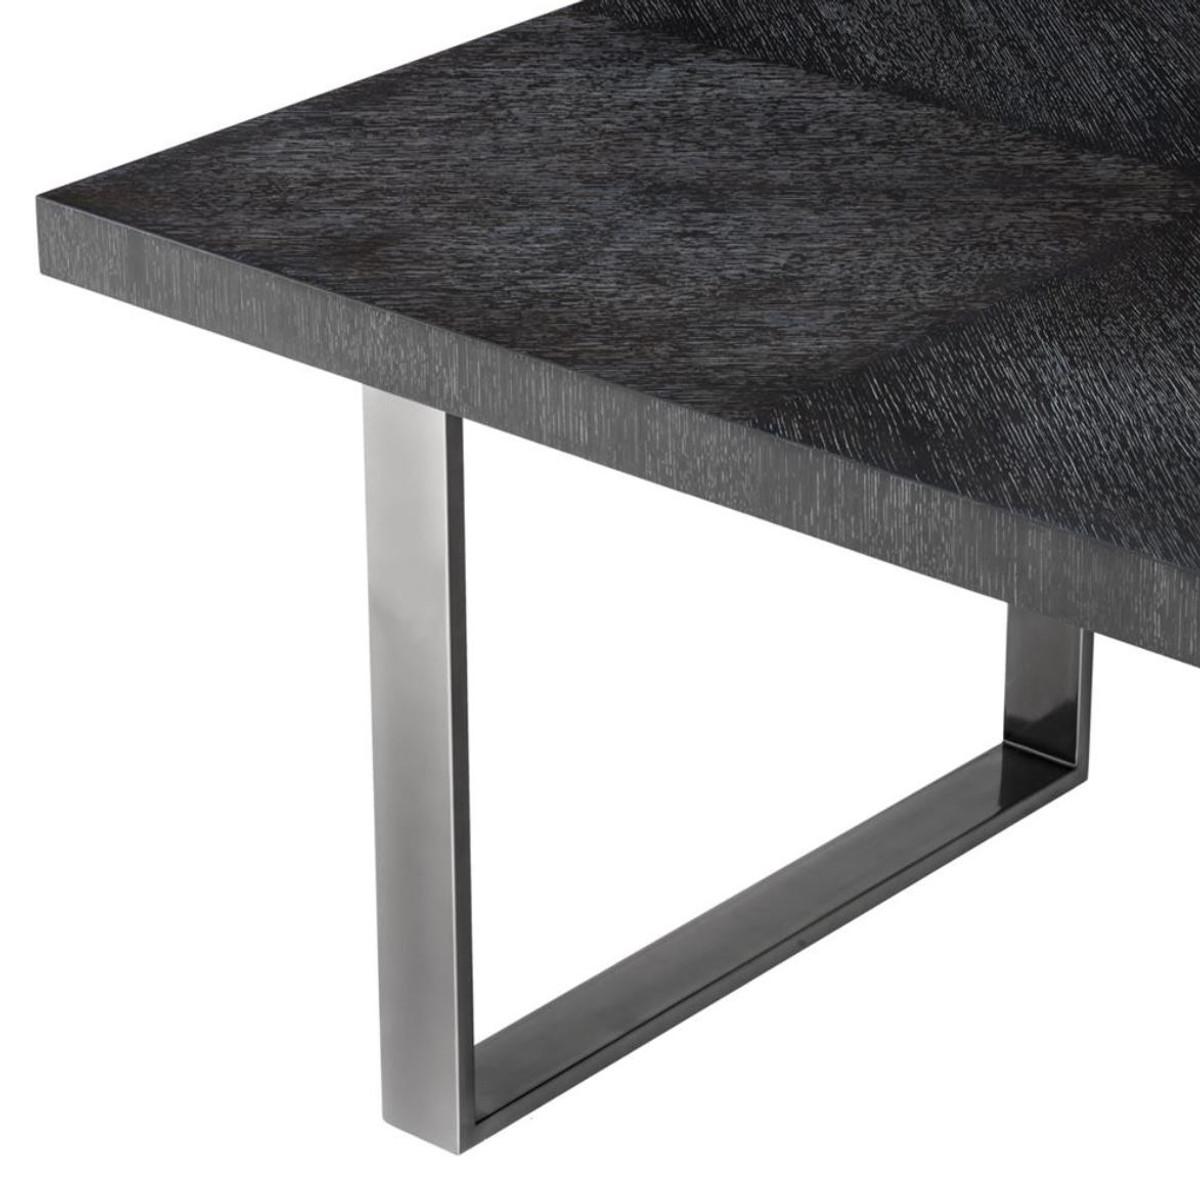 Casa Padrino mesa de comedor de lujo negro 250 x 110 x H. 75 cm - Muebles  de Comedor